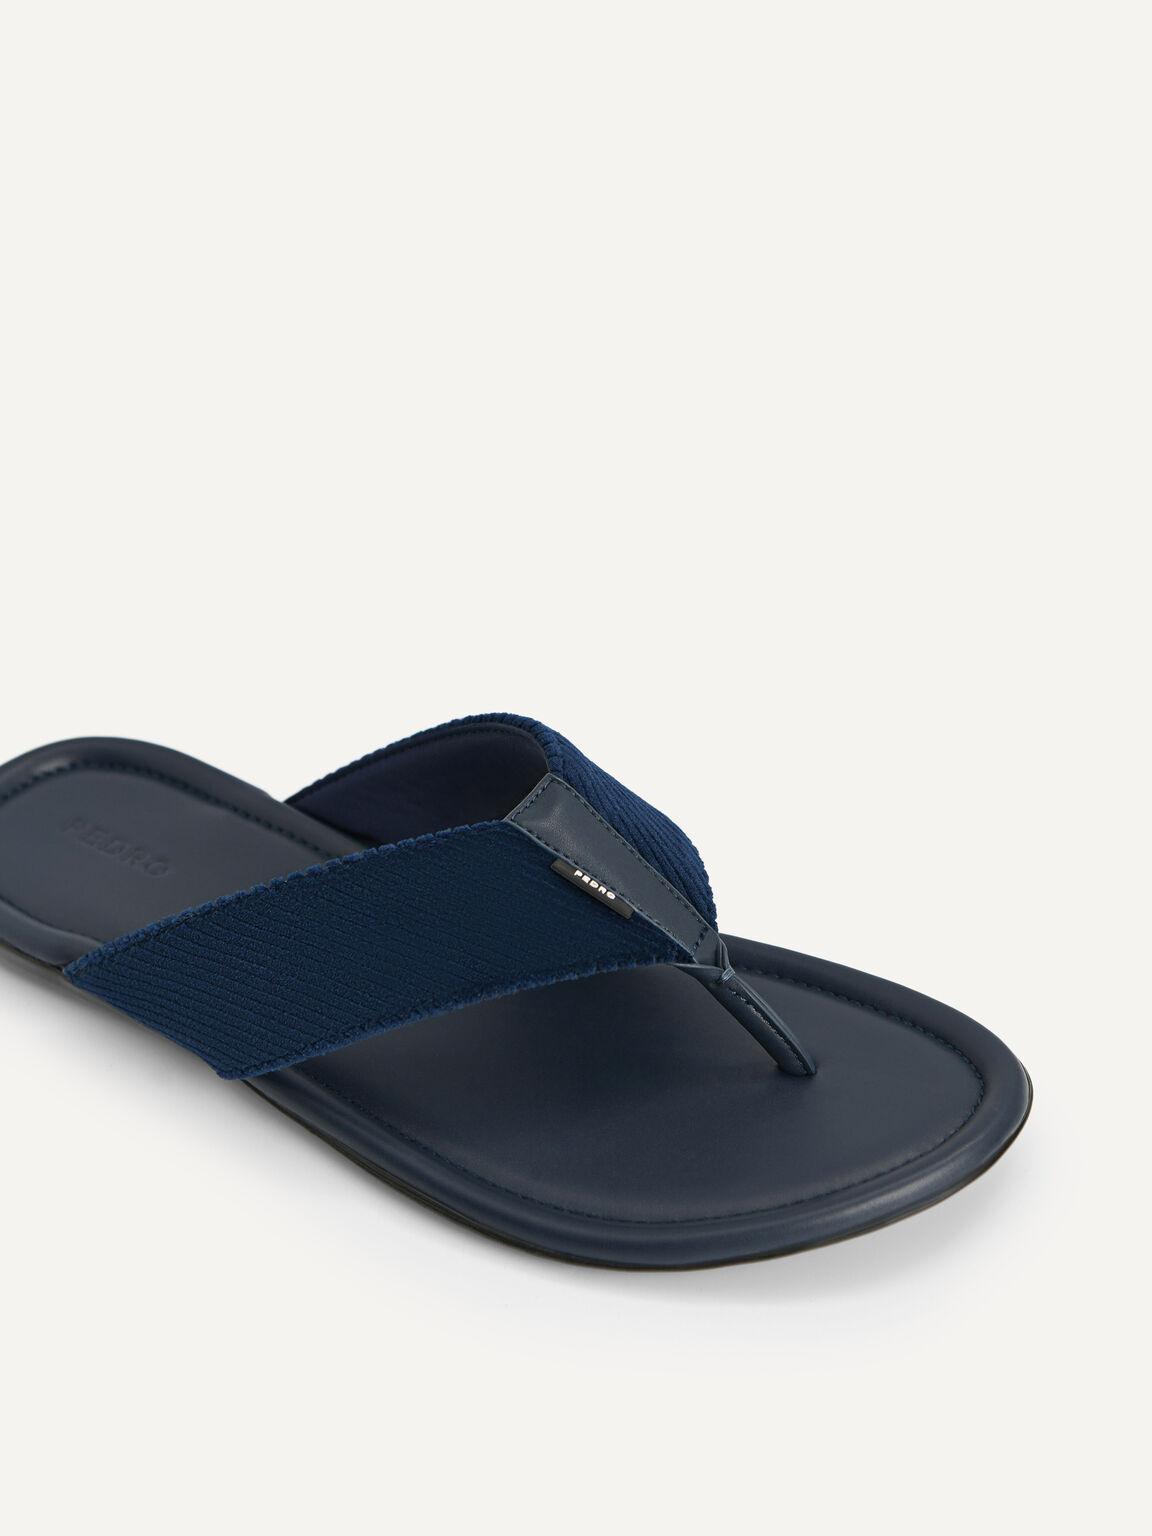 Corduroy Thong Sandals, Navy, hi-res